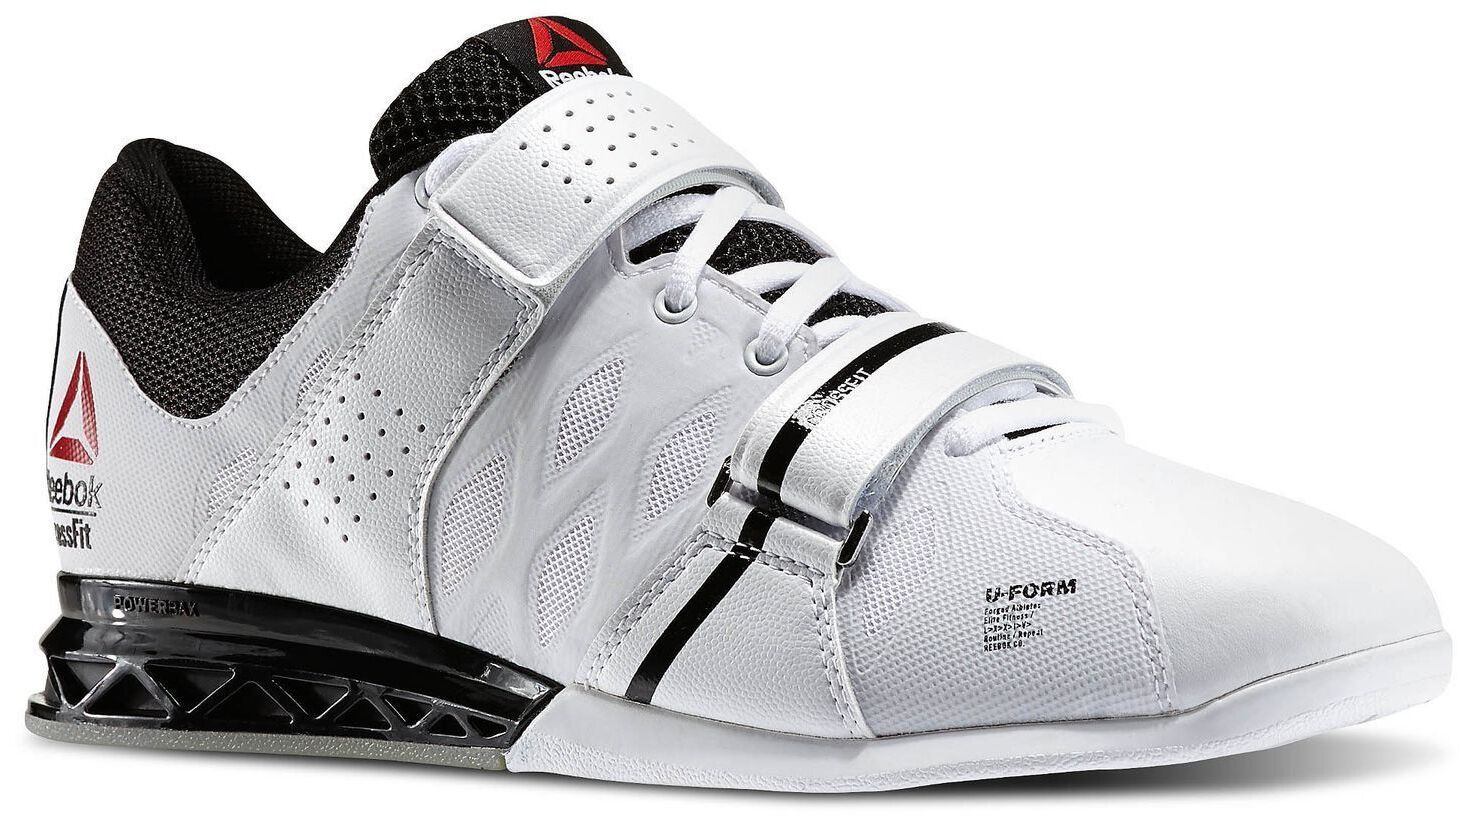 Reebok Weightlifting Shoes Australia